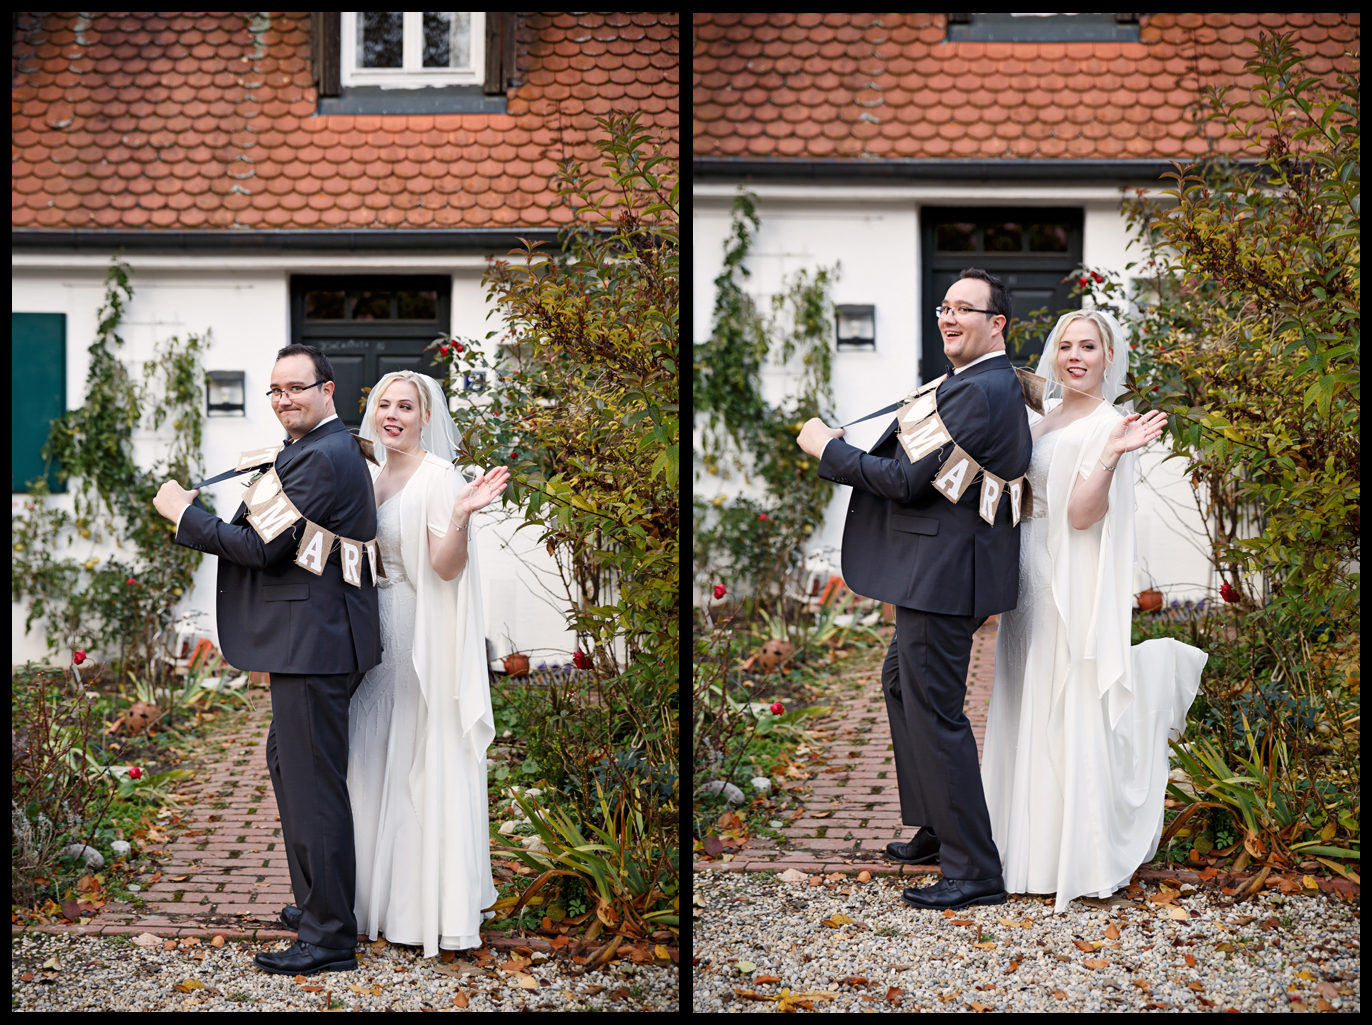 161112-Annika&Stefan-1652-3360-3365 Canon EOS 6D